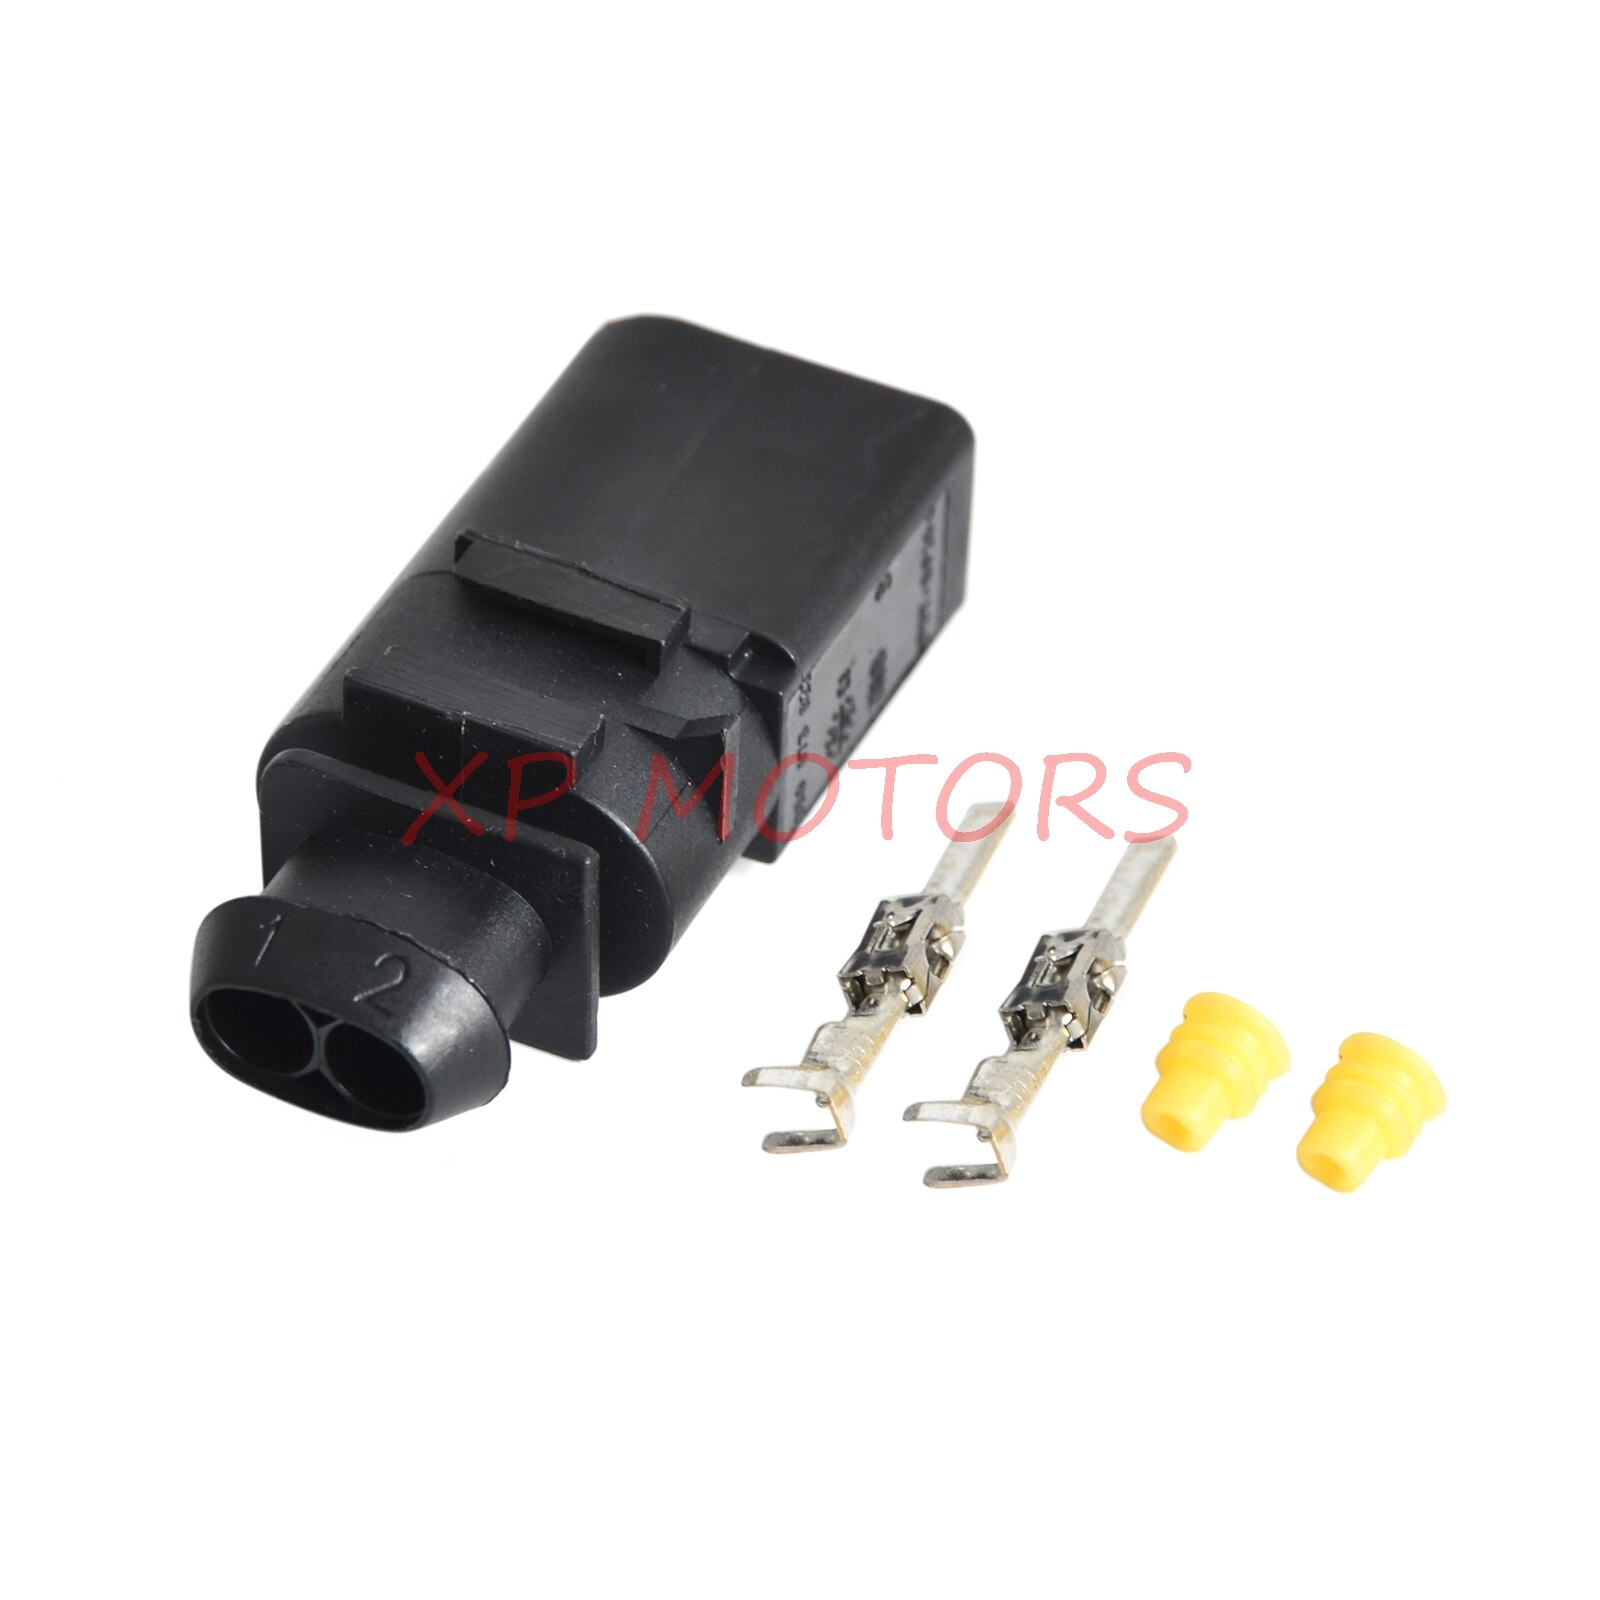 1J0 973 802-2 Pin Selado Kit Conector JPT Masculino-1J0973802 Serve para VW Audi